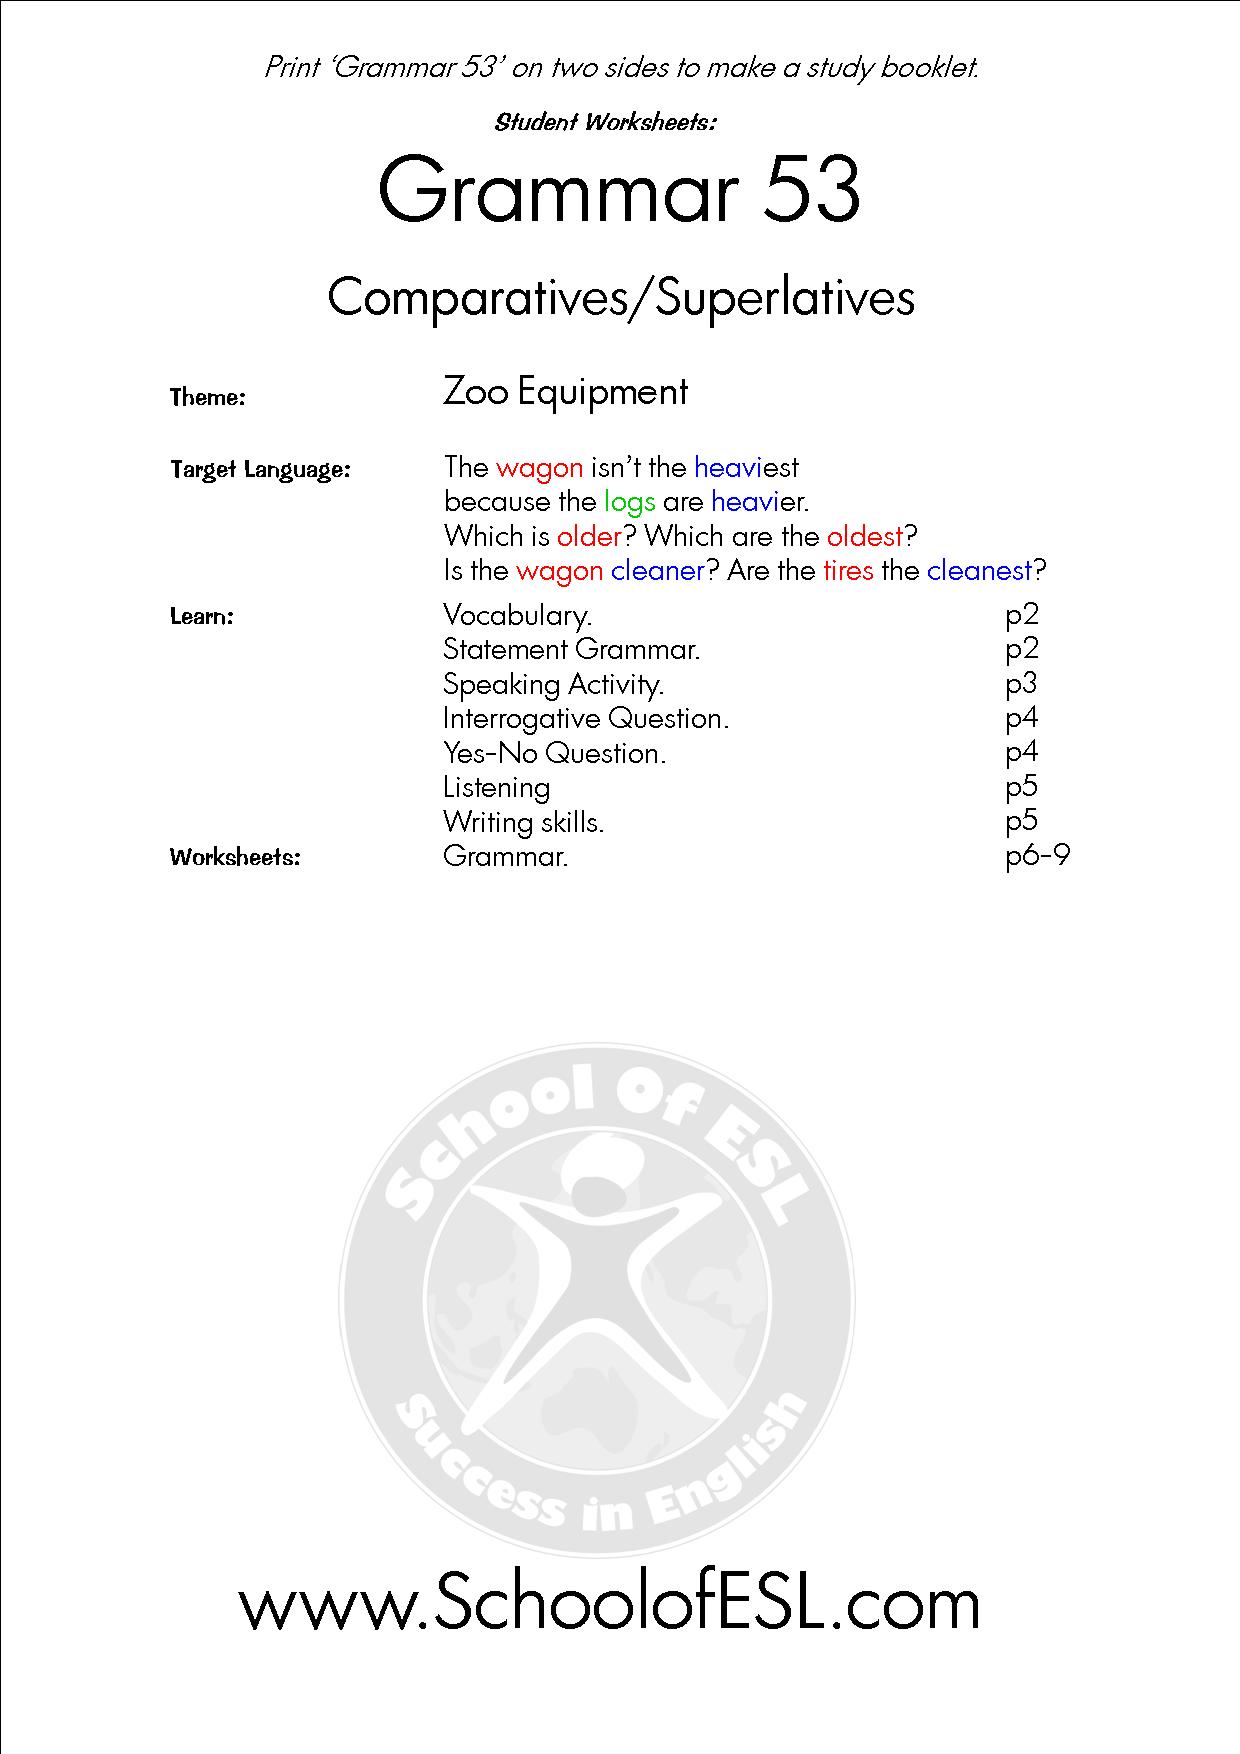 Grammar 53 Comparatives Superlatives Resources For